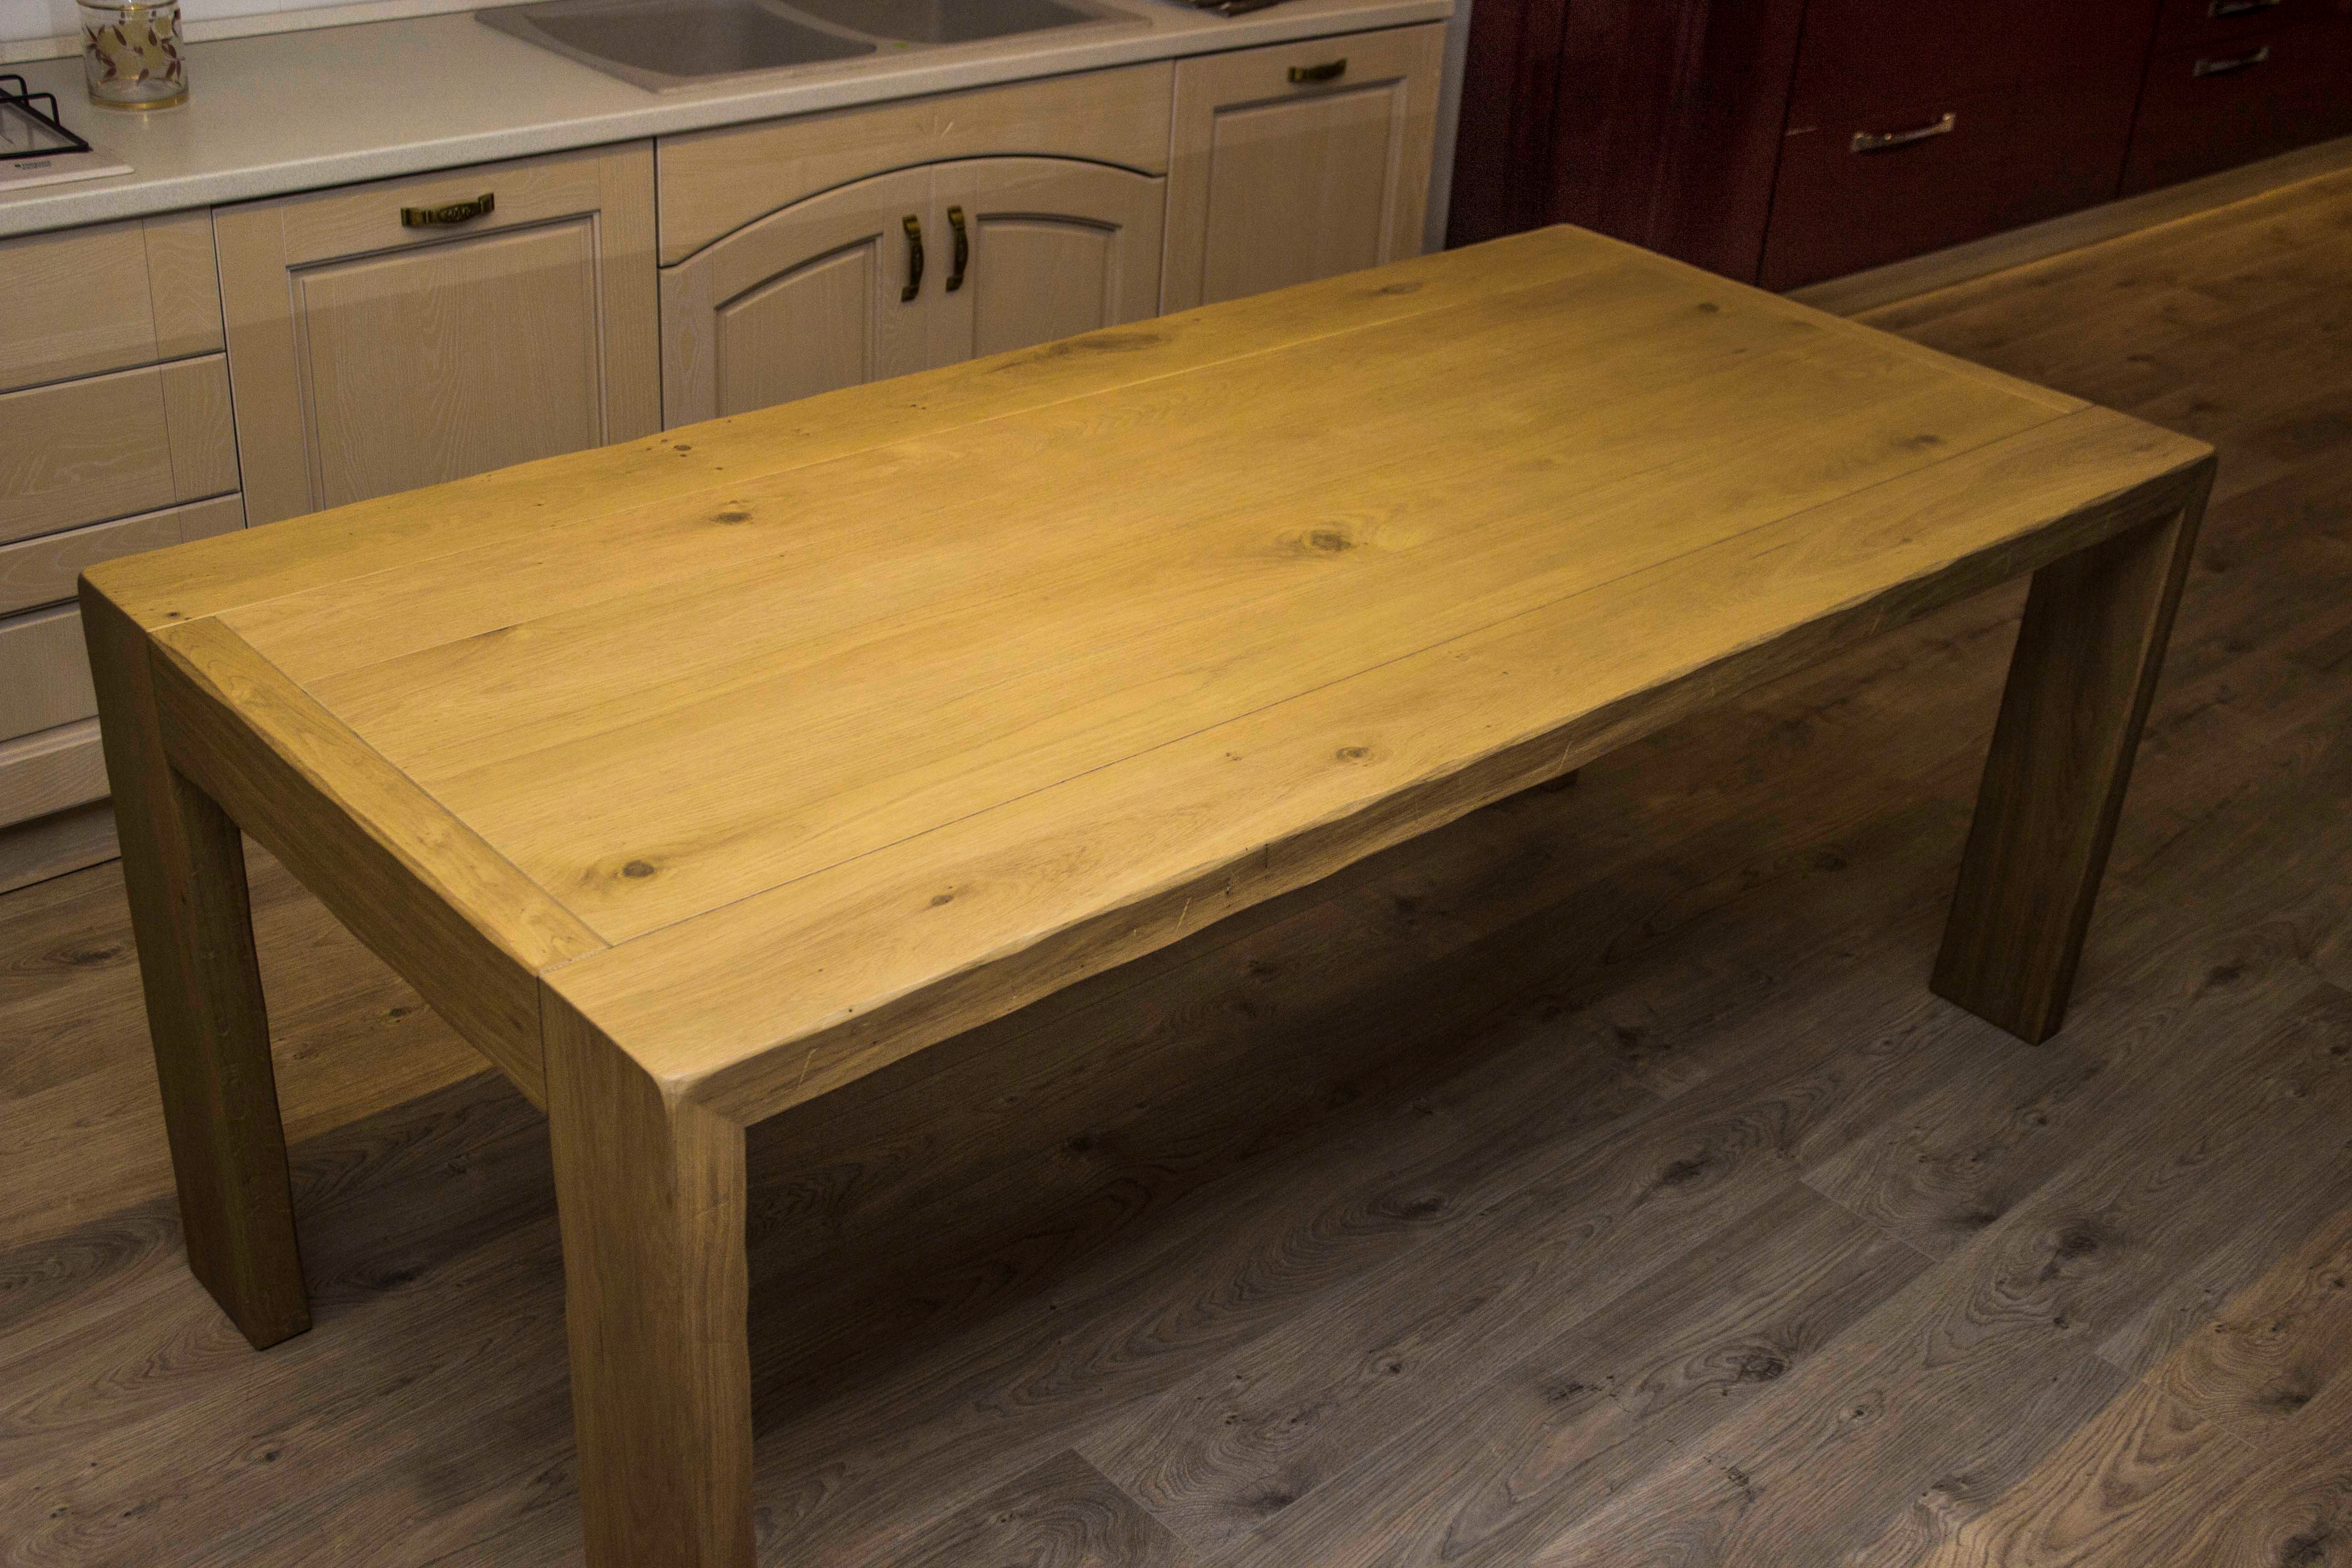 Tavoli cucine amazing tavoli da cucina allungabili per cucine designs tavolo allungabile - Tavoli per cucine ...